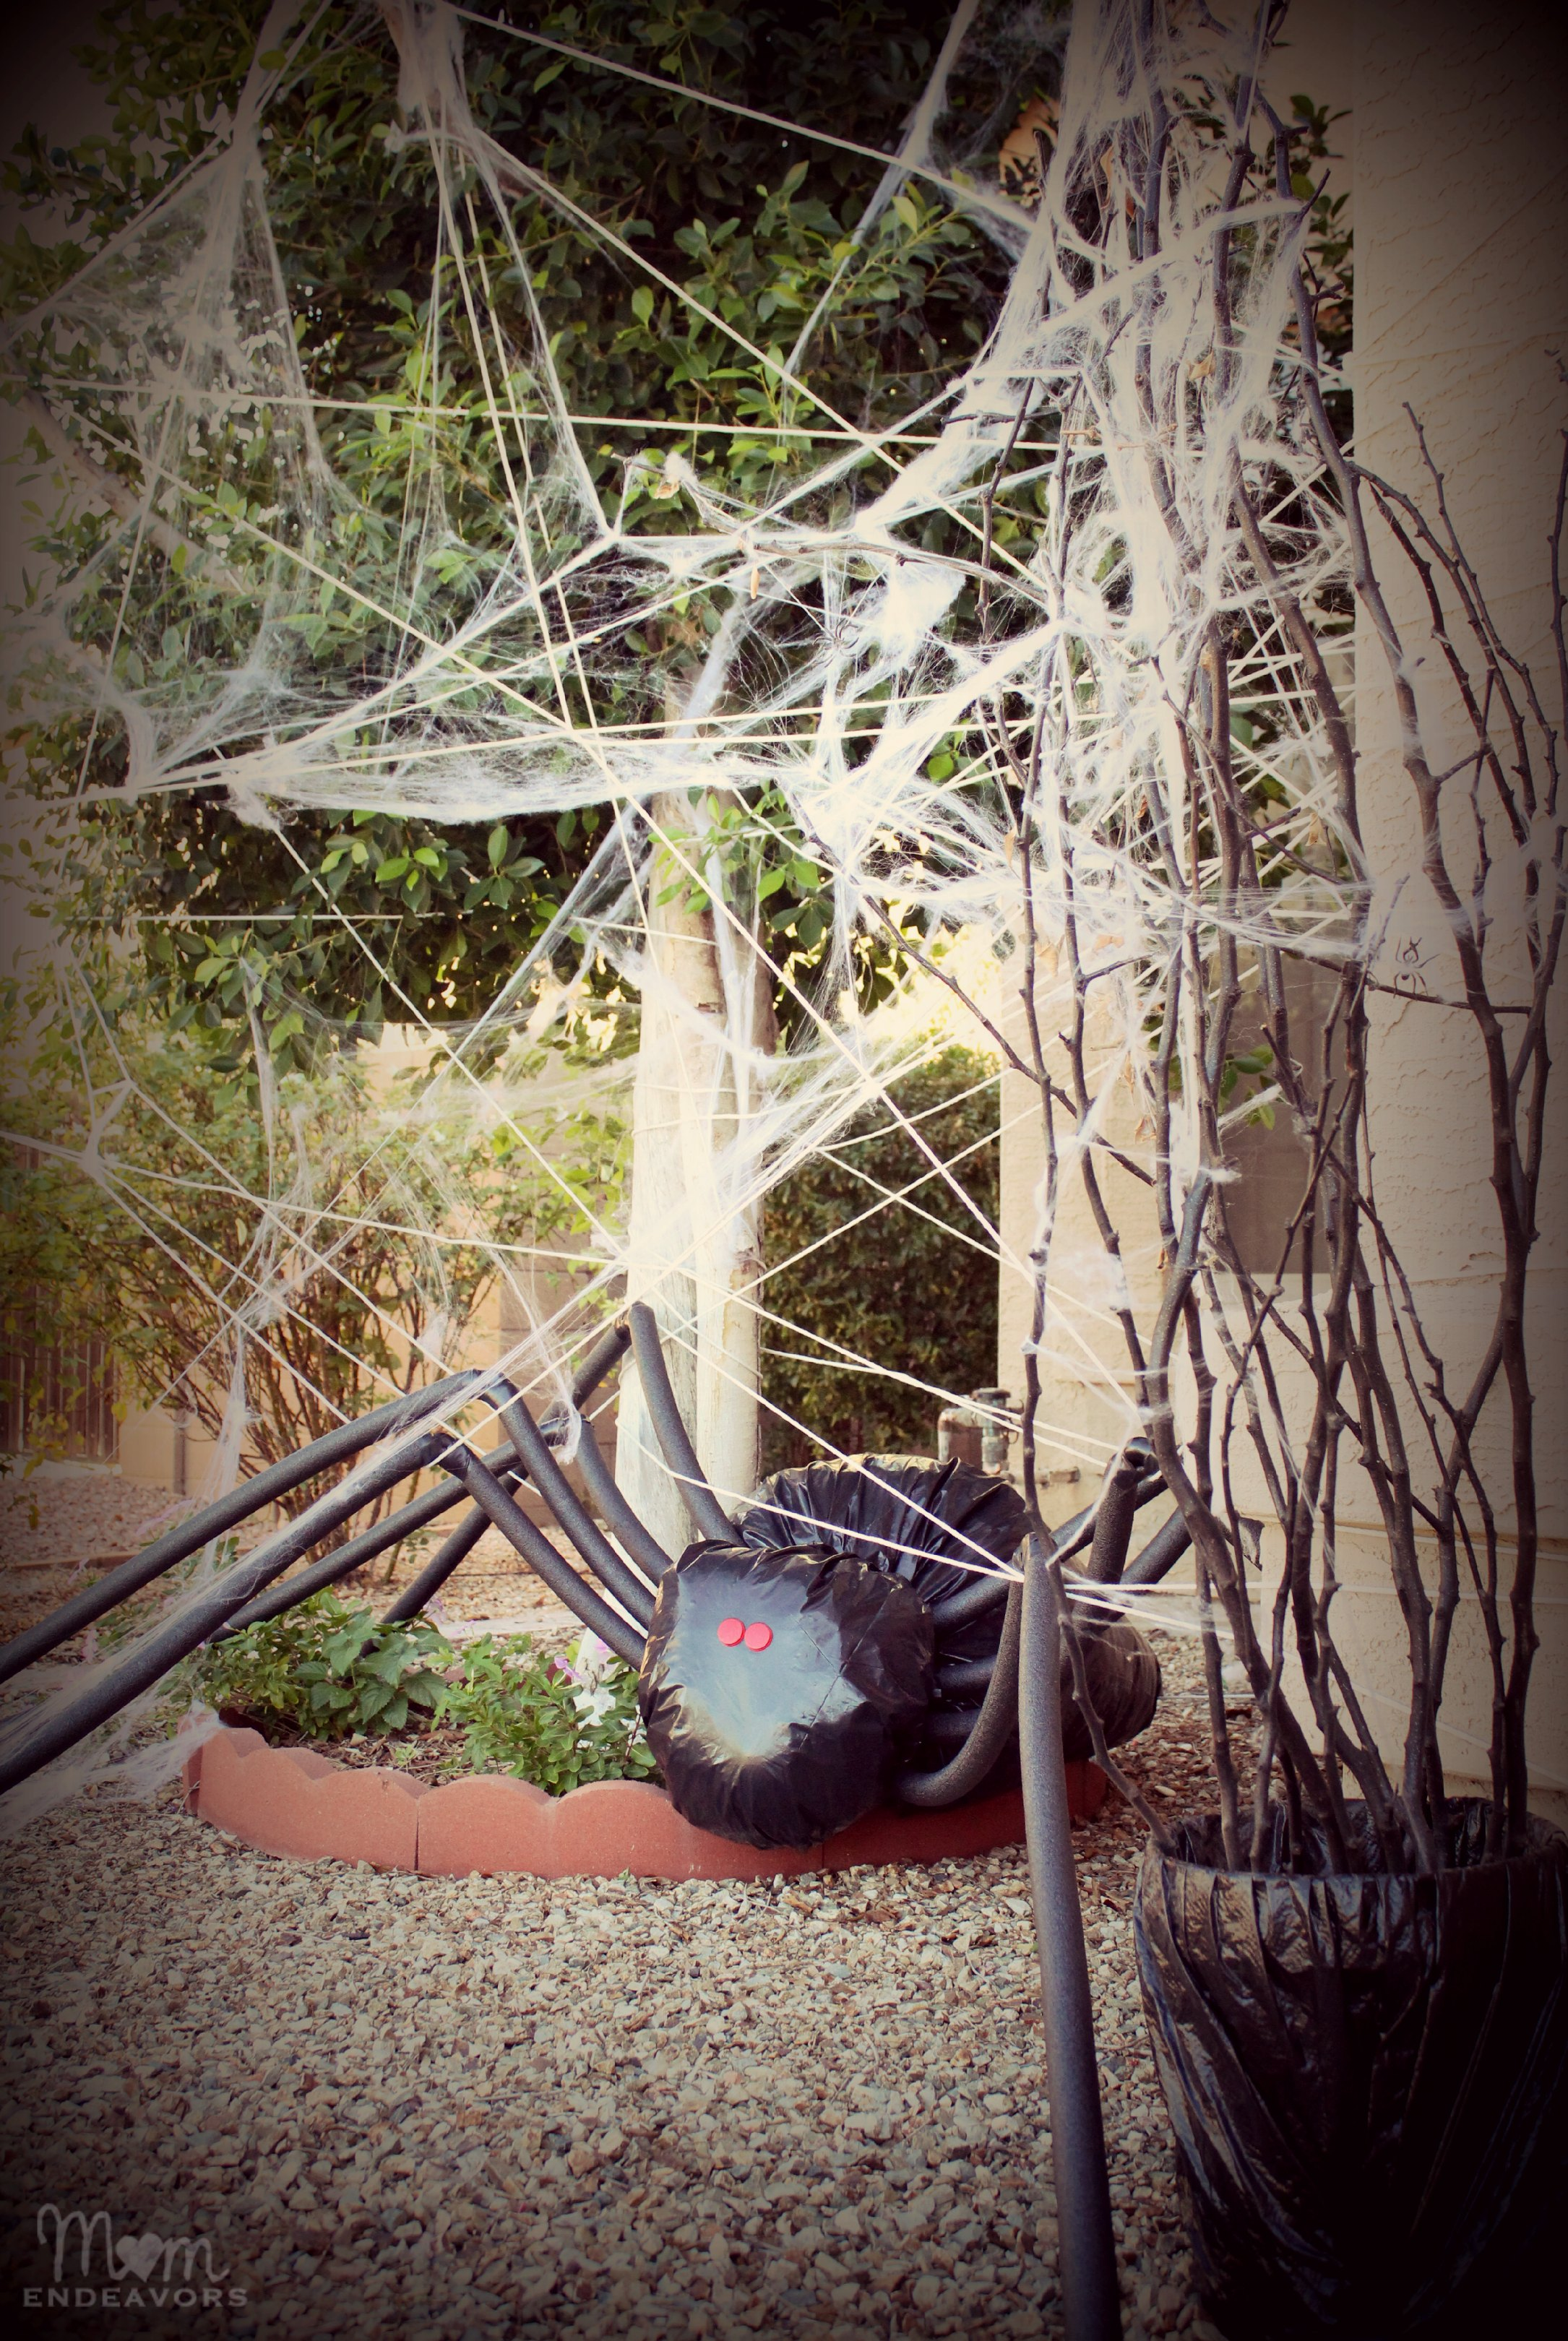 DIY Halloween Yard Decor Giant Spider in Spiderweb Mom